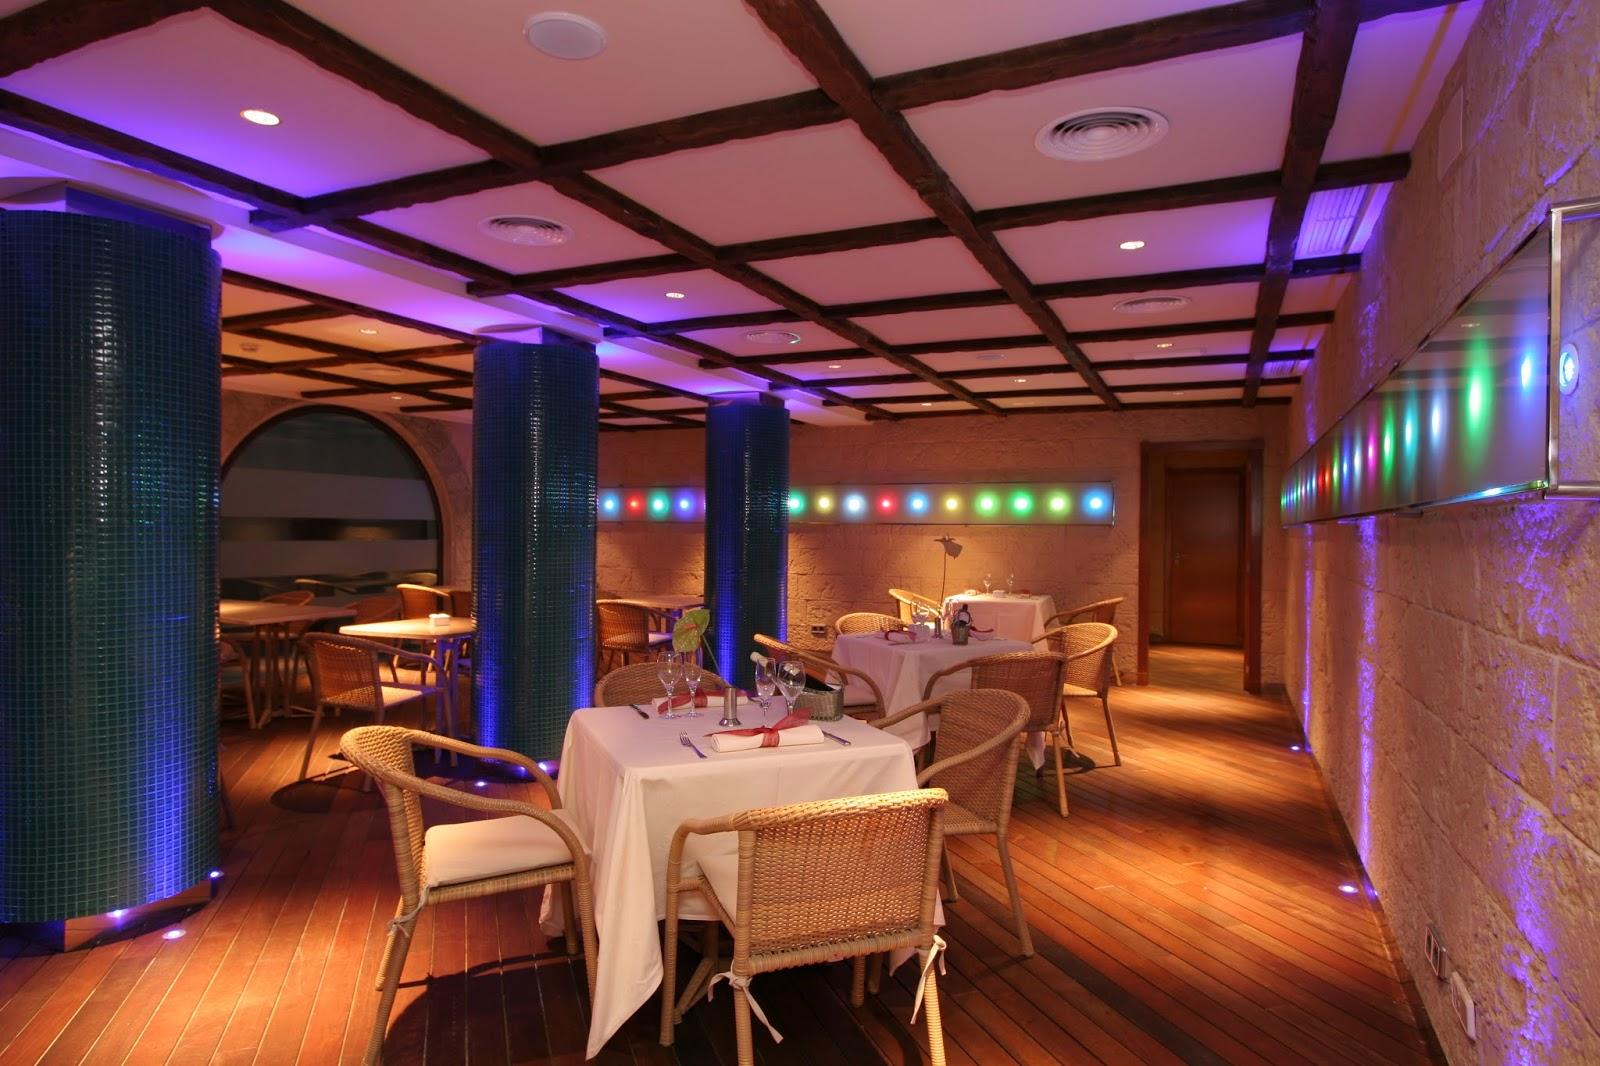 El bolo creativo restaurante de piscina hotel nixie palace for Alberca restaurante